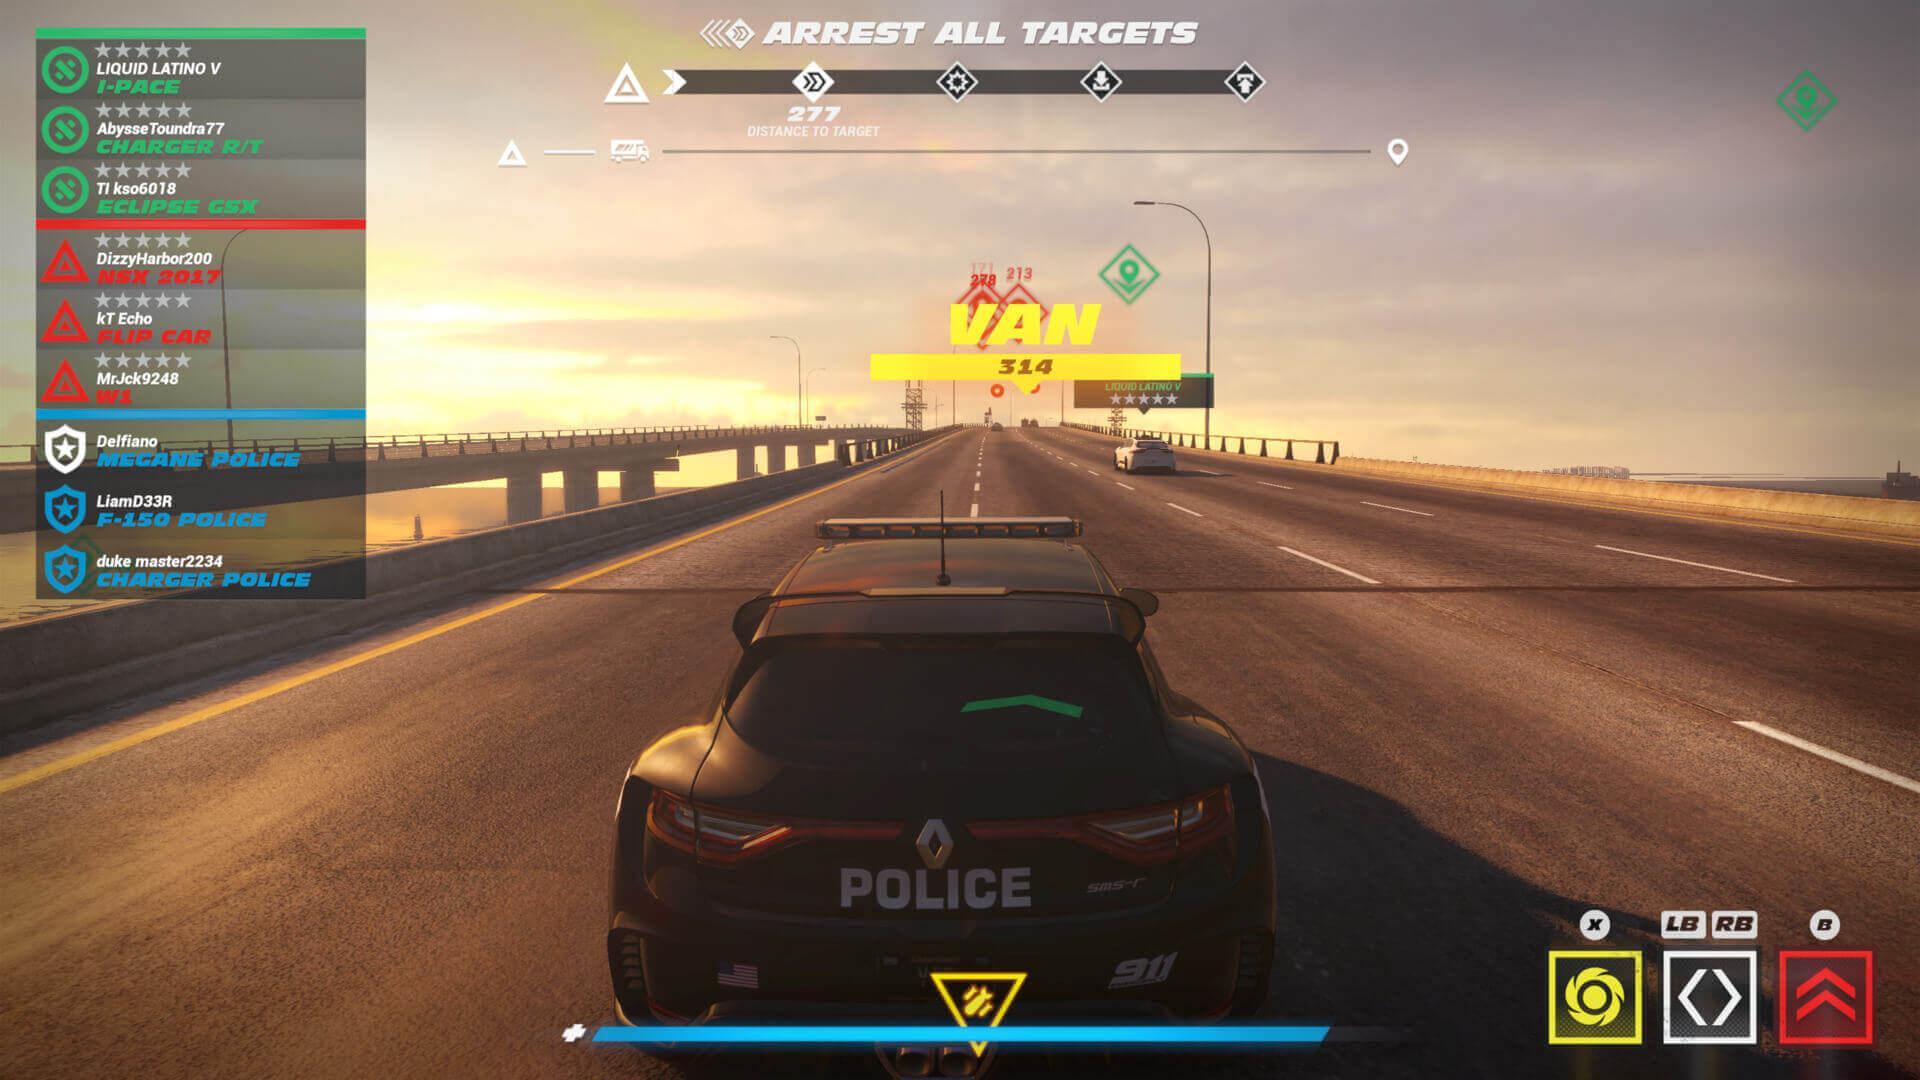 Análise Velozes e Furiosos: Encruzilhada, Velozes e Furiosos, Encruzilhada, Fast and Furious: Crossroads, Delfos, Bandai Namco